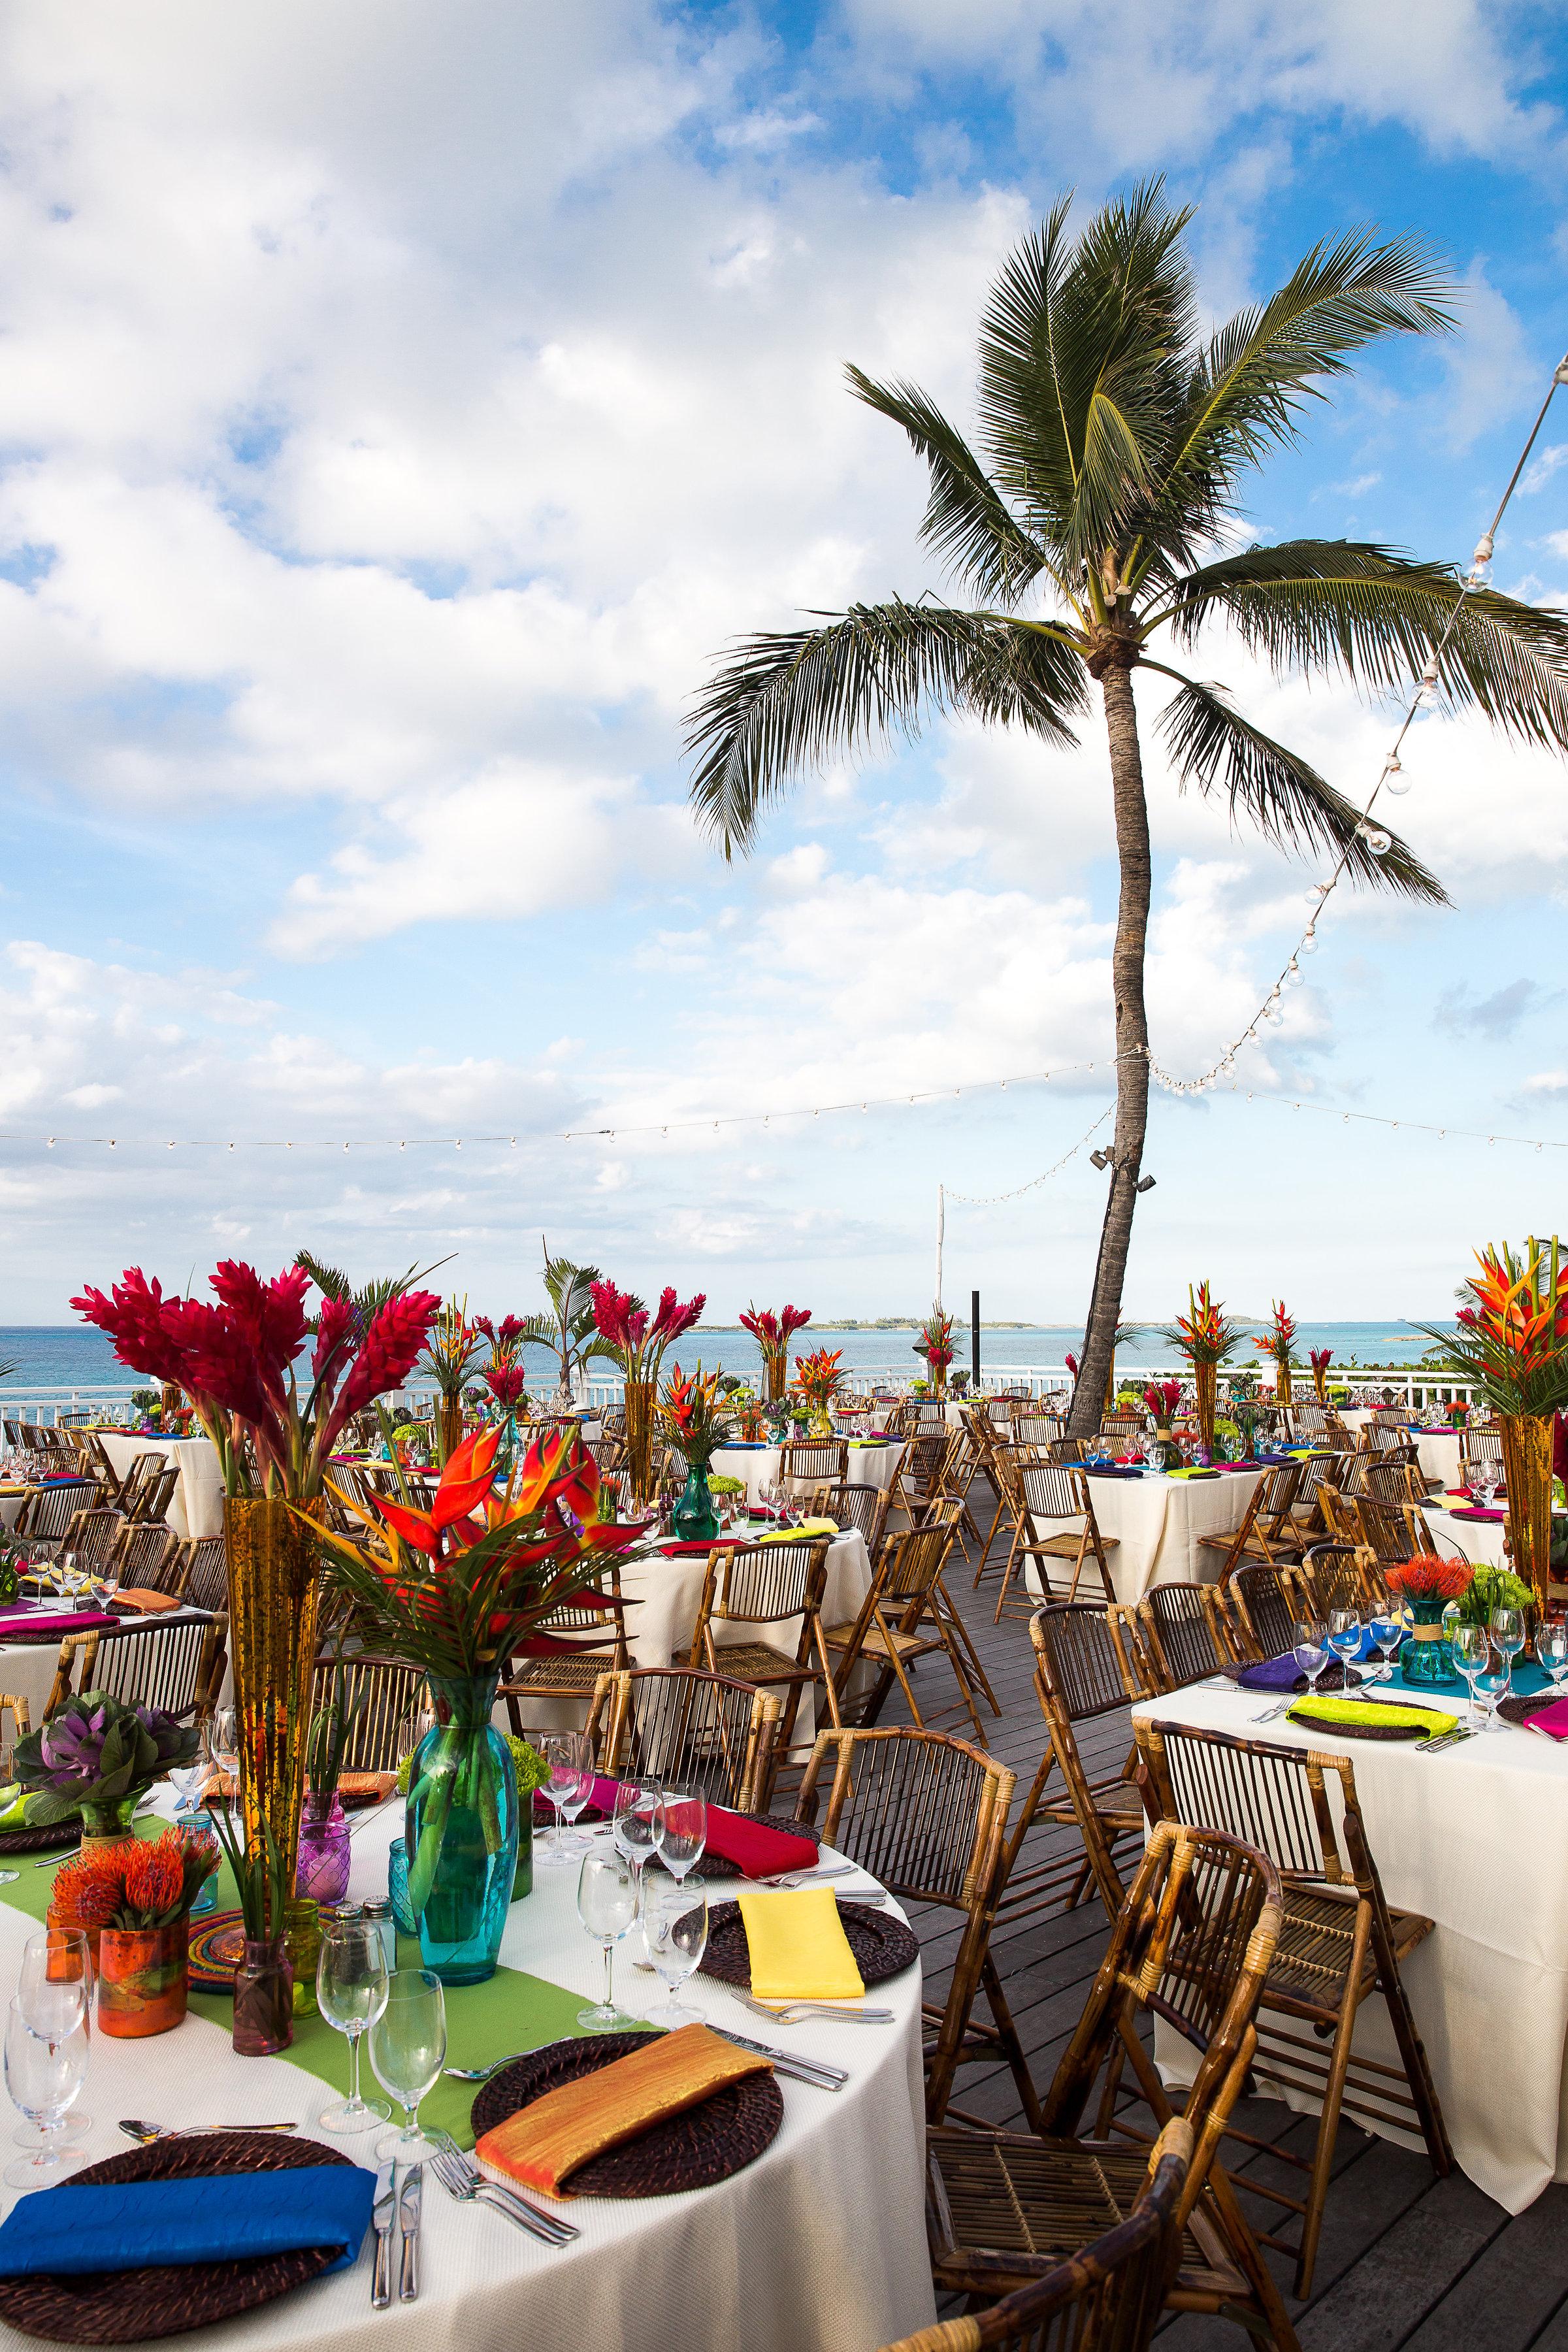 Ceci_New_York_Ceci_Style_Ceci_Johnson_Luxury_Lifestyle_Destination_Bahamas_Wedding_Letterpress_Inspiration_Design_Custom_Couture_Personalized_Invitations_22.jpg